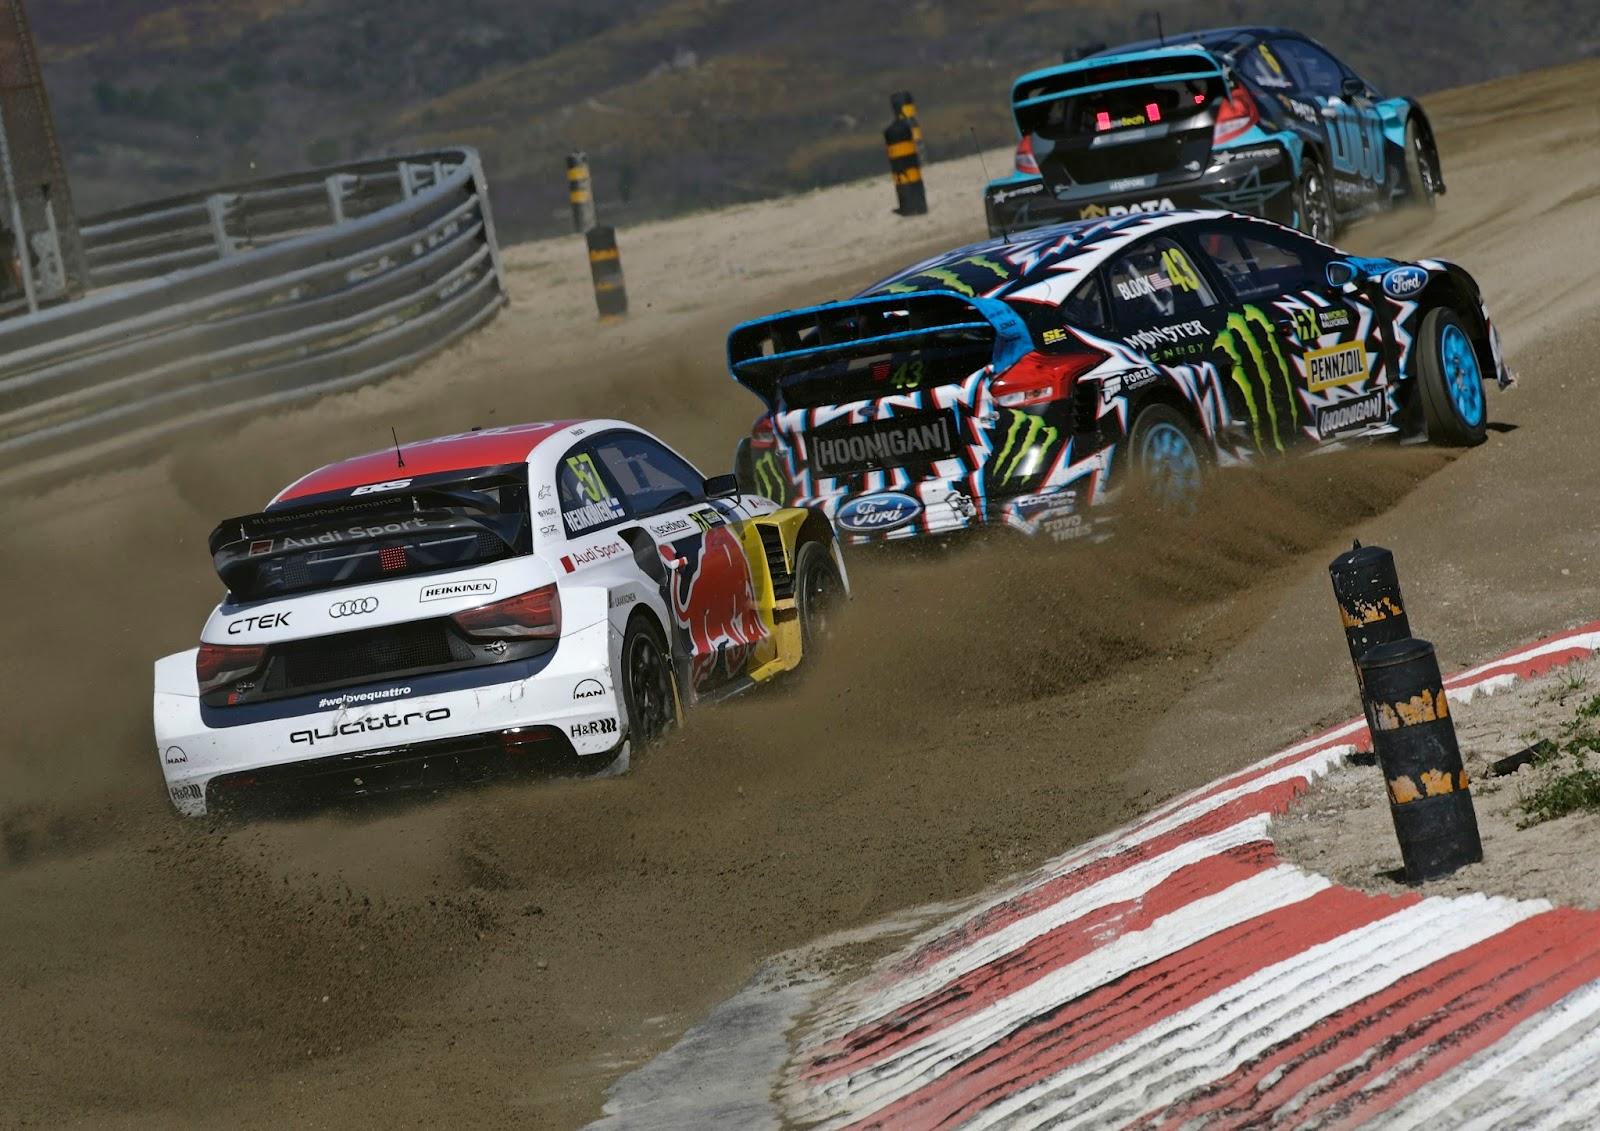 A173379 large Δες όλο τον αγώνα του συναρπαστικού Rallycross FIA, FIA World Rallycross Championship, Rally, videos, World RX